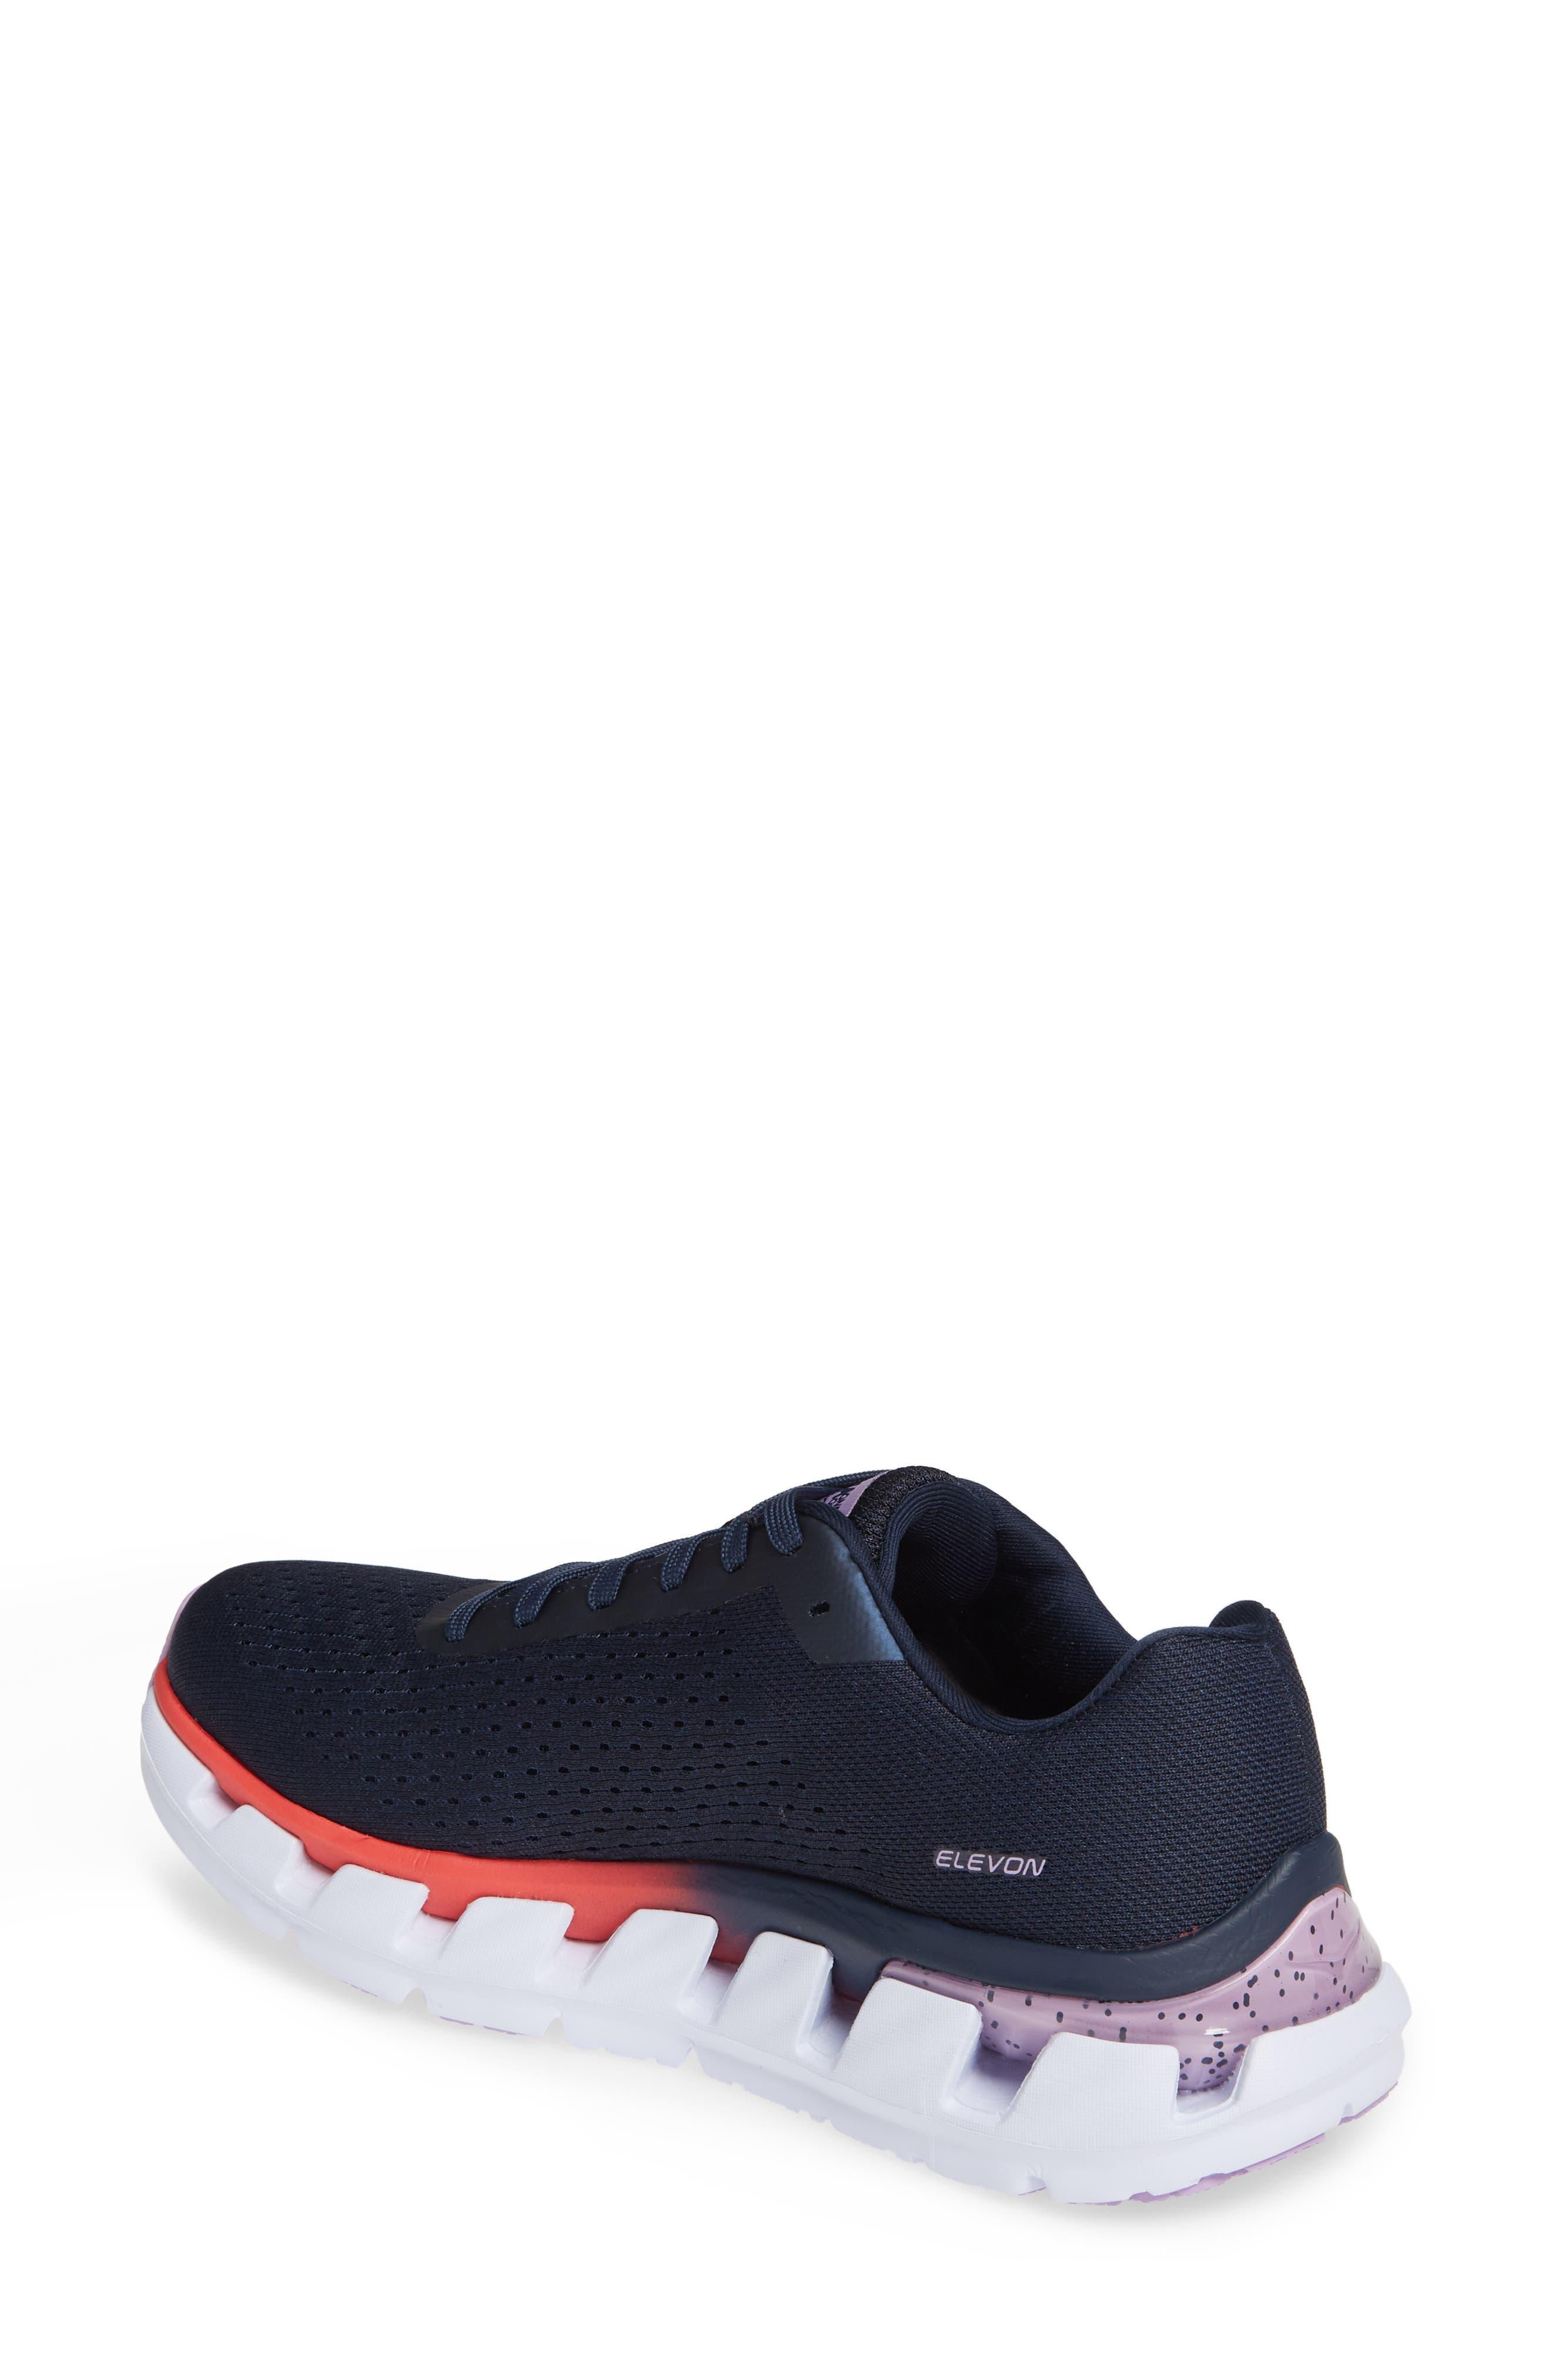 Elevon Running Shoe,                             Alternate thumbnail 2, color,                             001